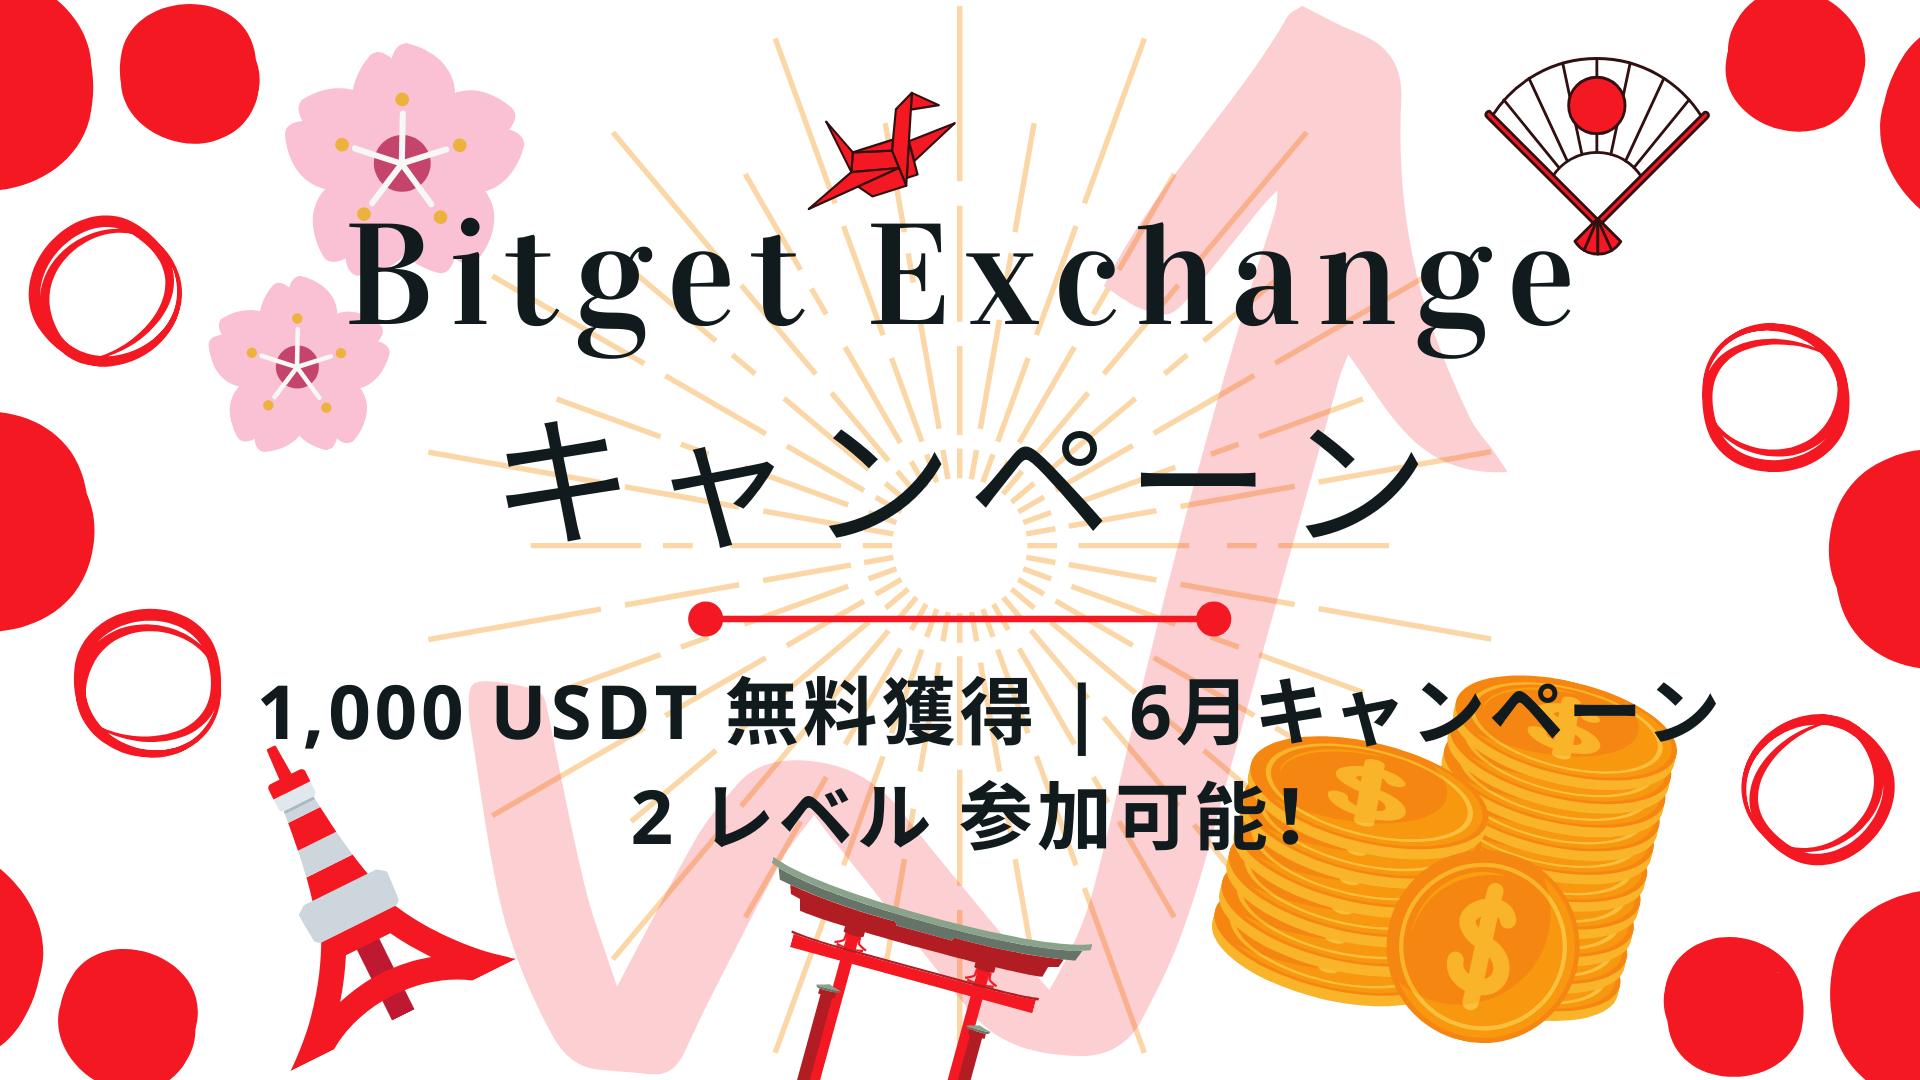 「Bitget」新規登録で全員に$20ボーナス!コピートレードも利用できます!